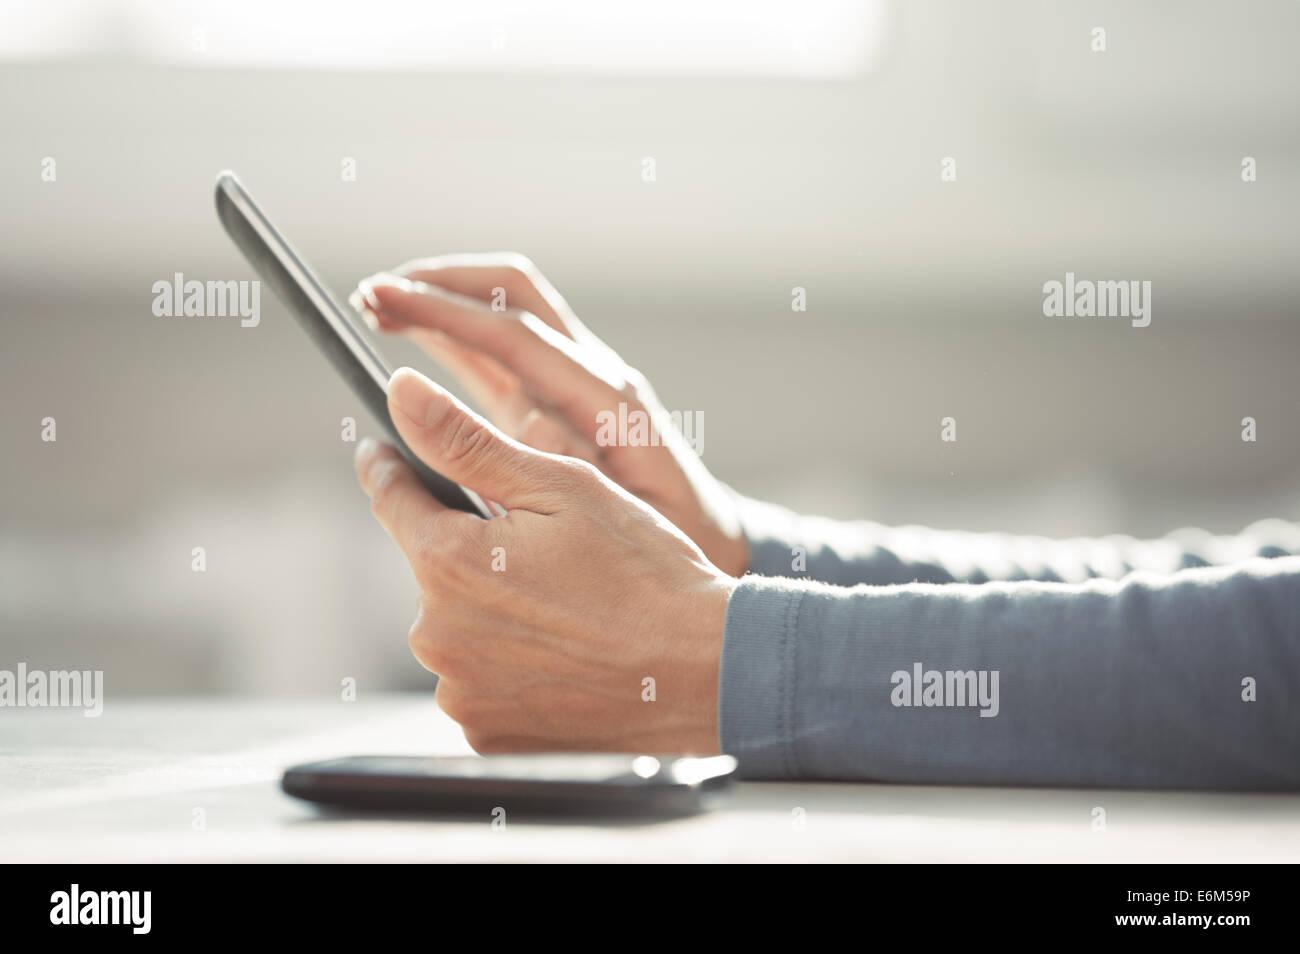 Hände der Frau arbeitet mit digital-Tablette Stockbild